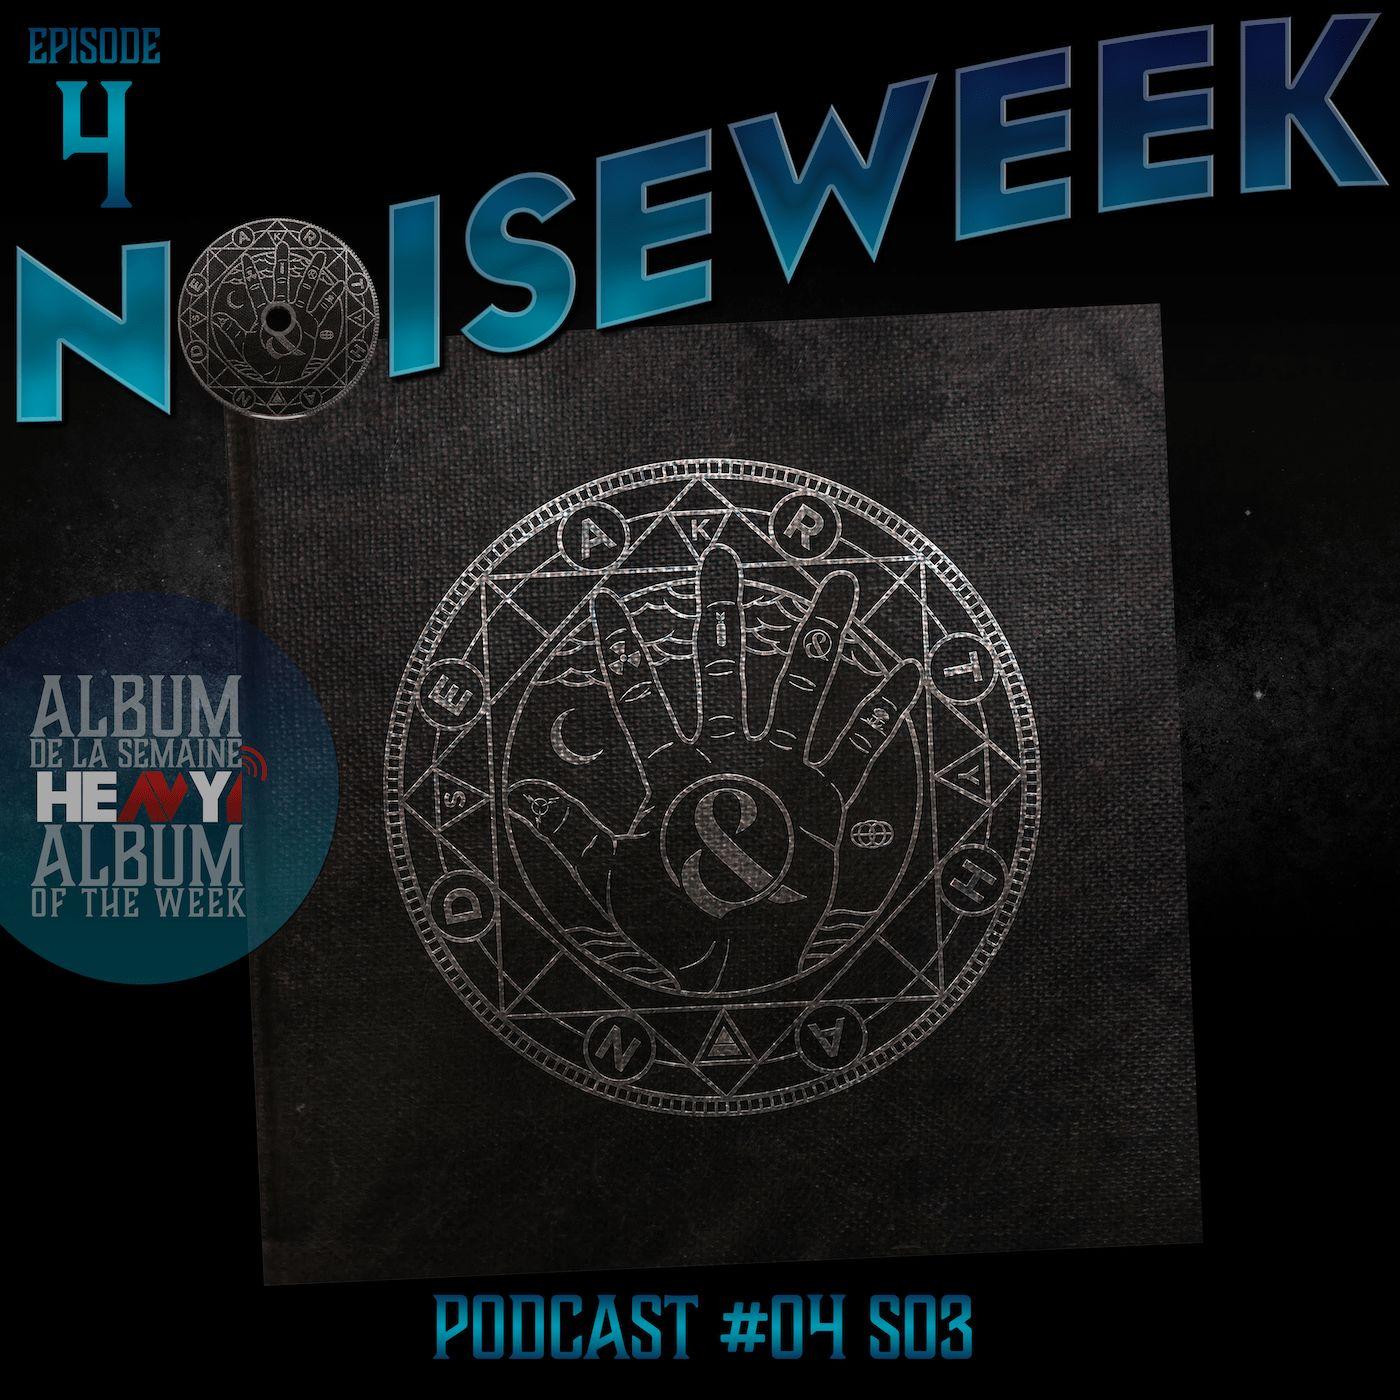 Noiseweek #04 Saison 3